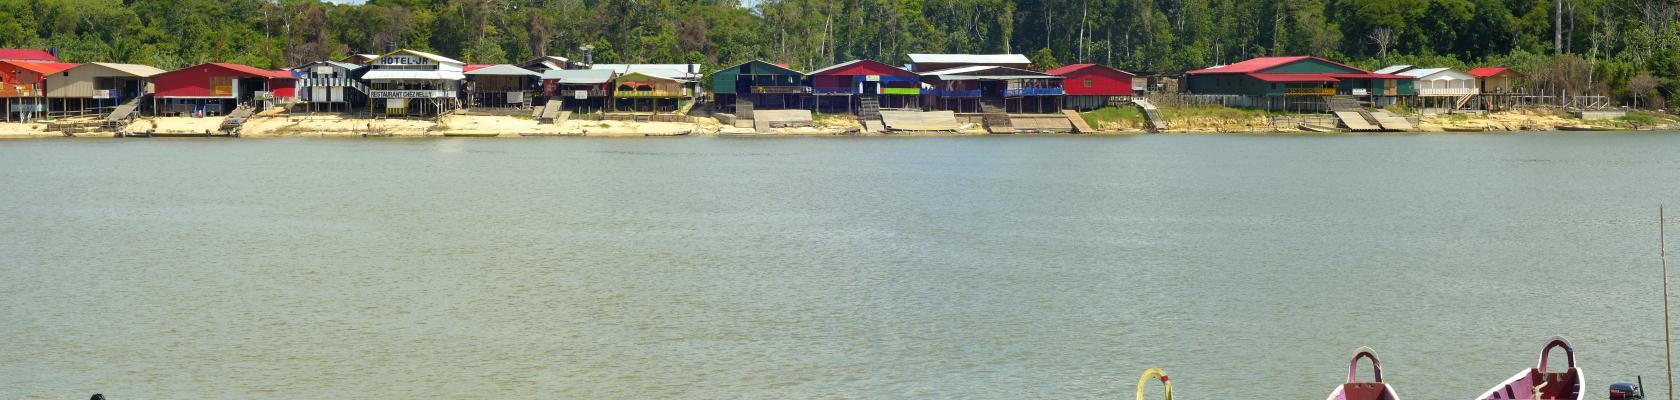 Rive du Maroni, Maripasoula, Guyane